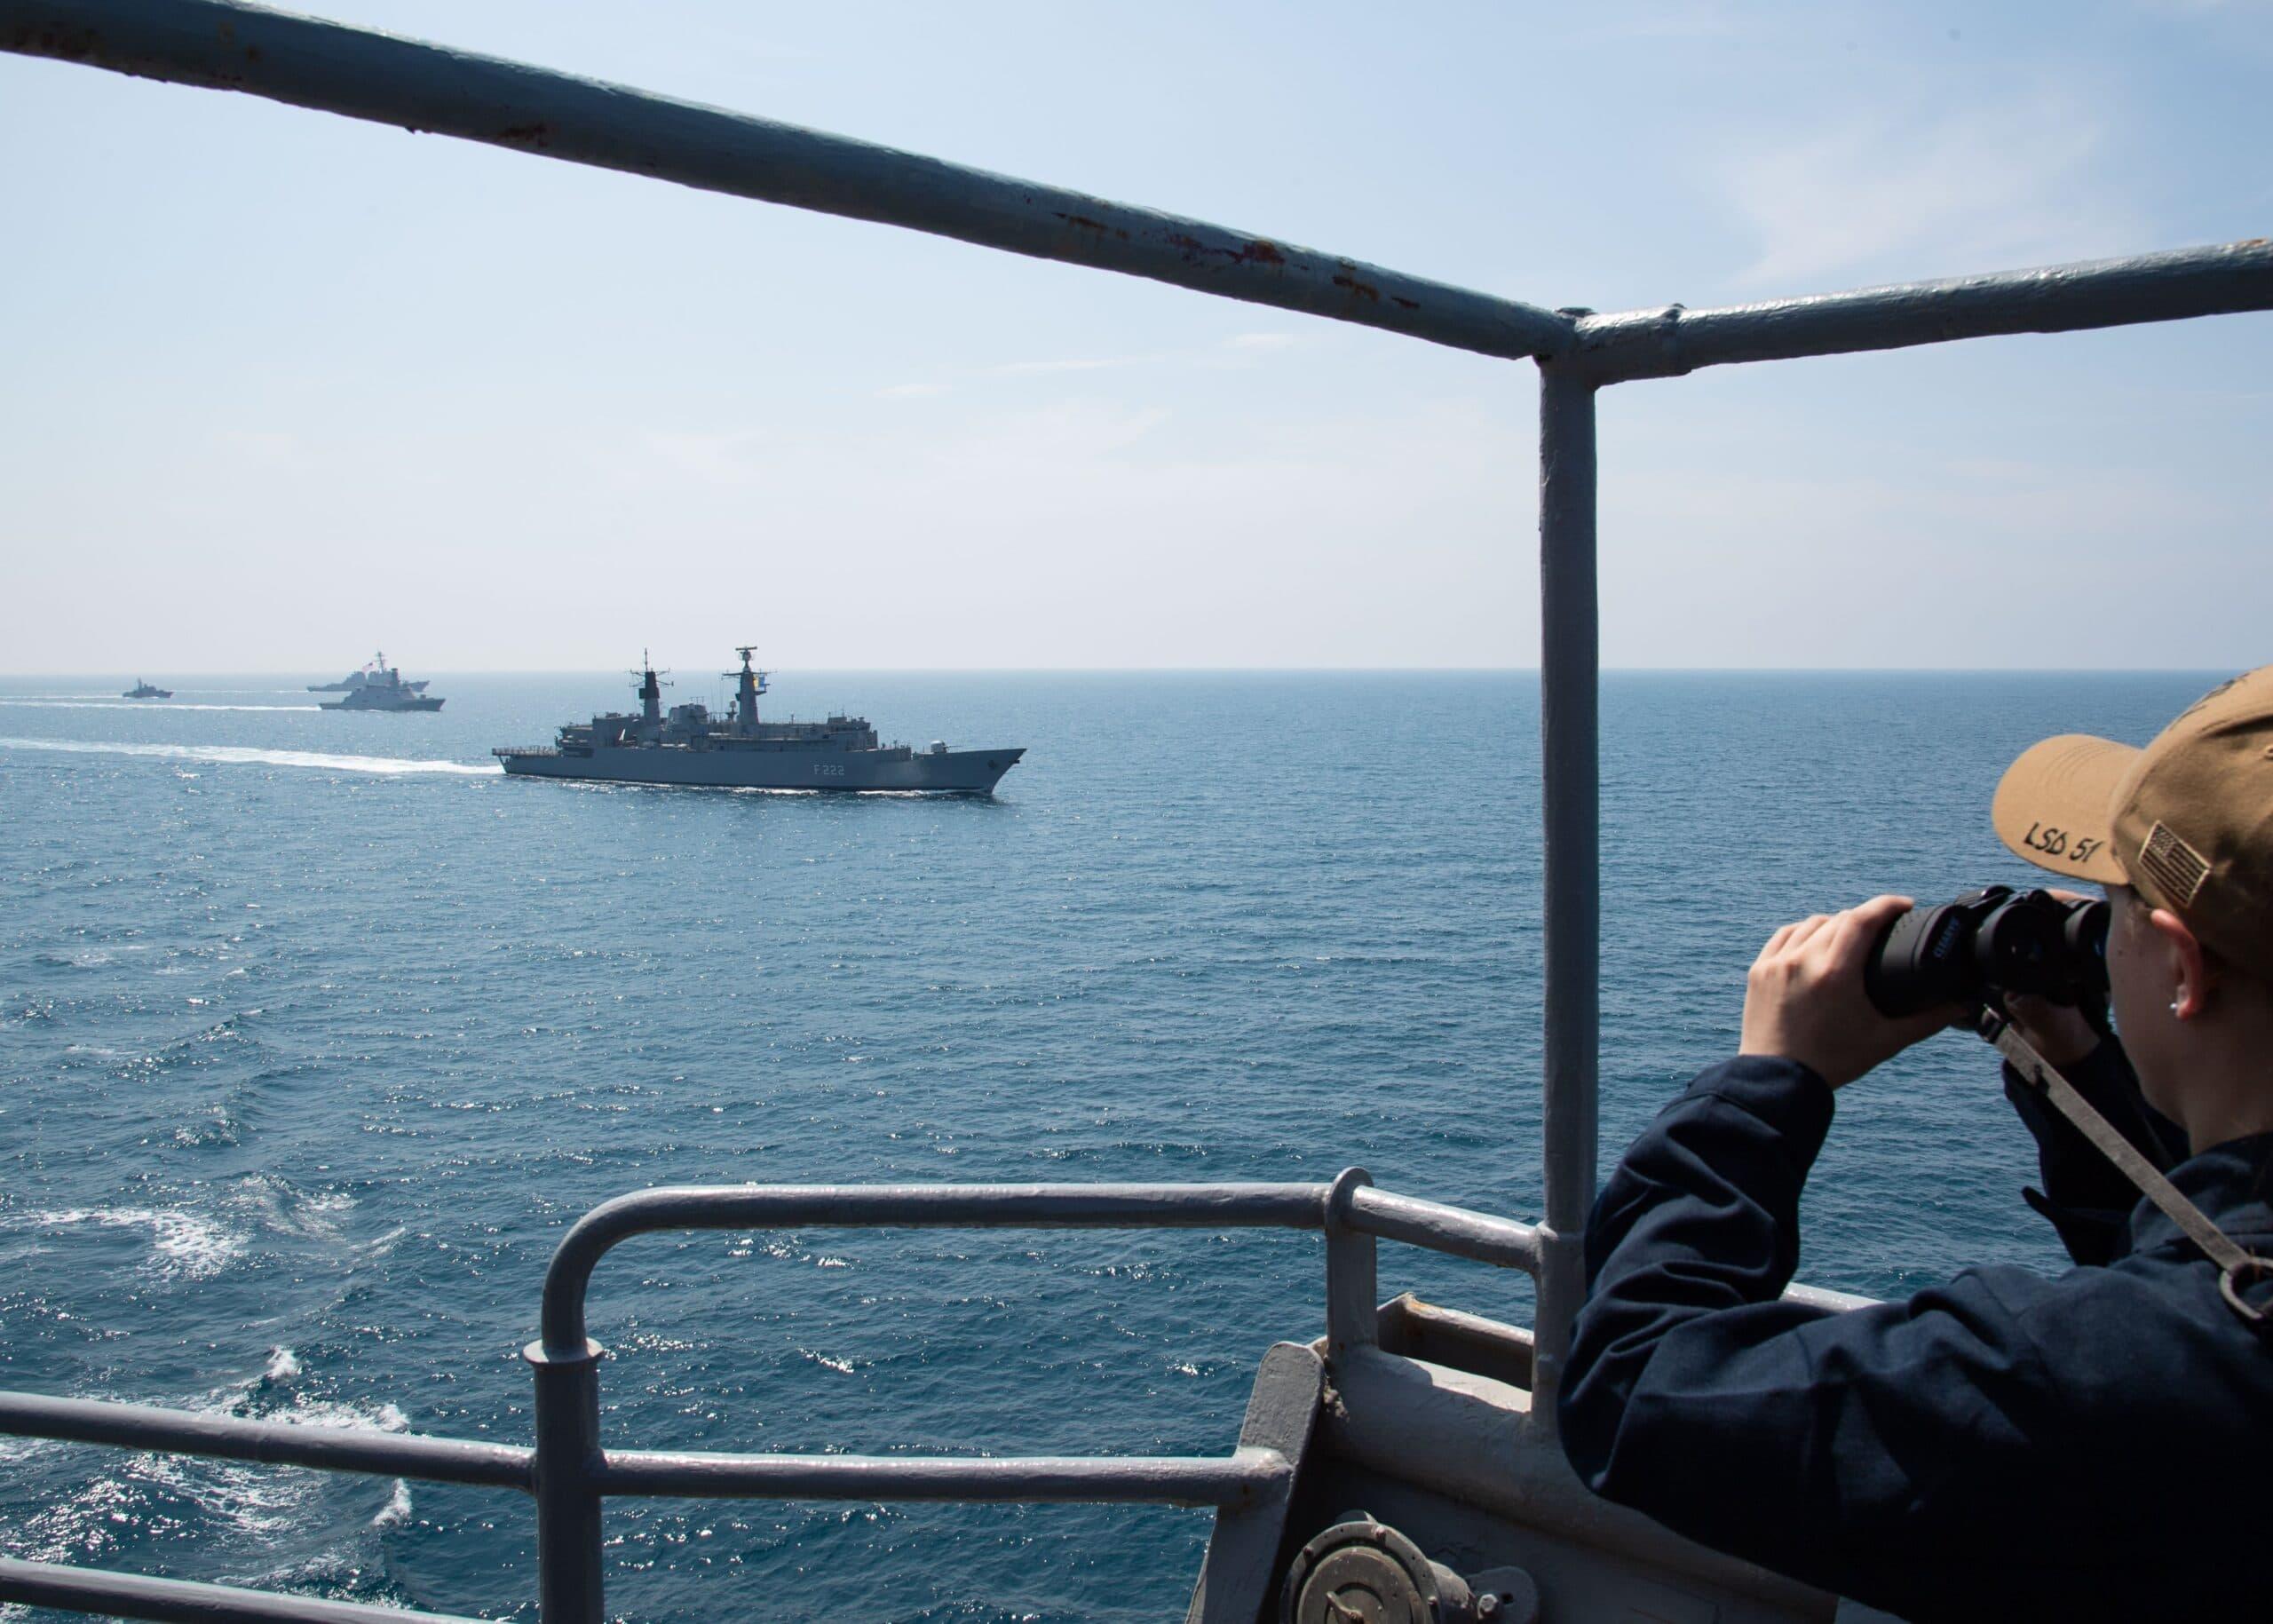 blacksea exercise 3 scaled - naval post